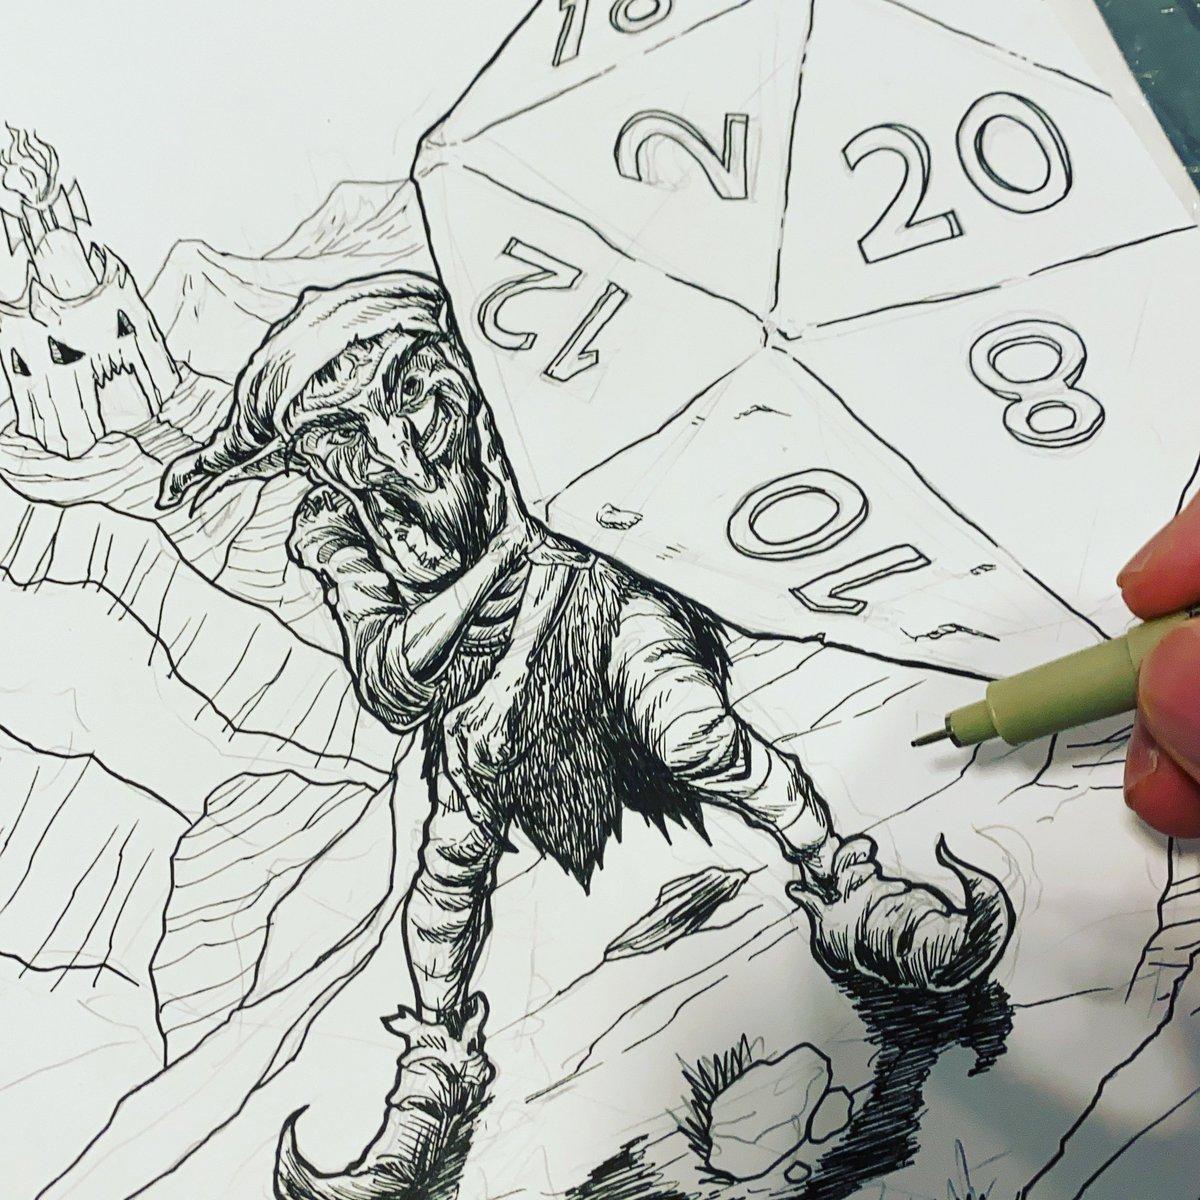 A #Goblin pushing a #d20 boulder up a mountain... A metaphor of #IndieGame creators?!  #TTRPG #DnD #Artwork #BlackAndWhiteArt #ShowYourWork https://t.co/ts8NyQcuVL